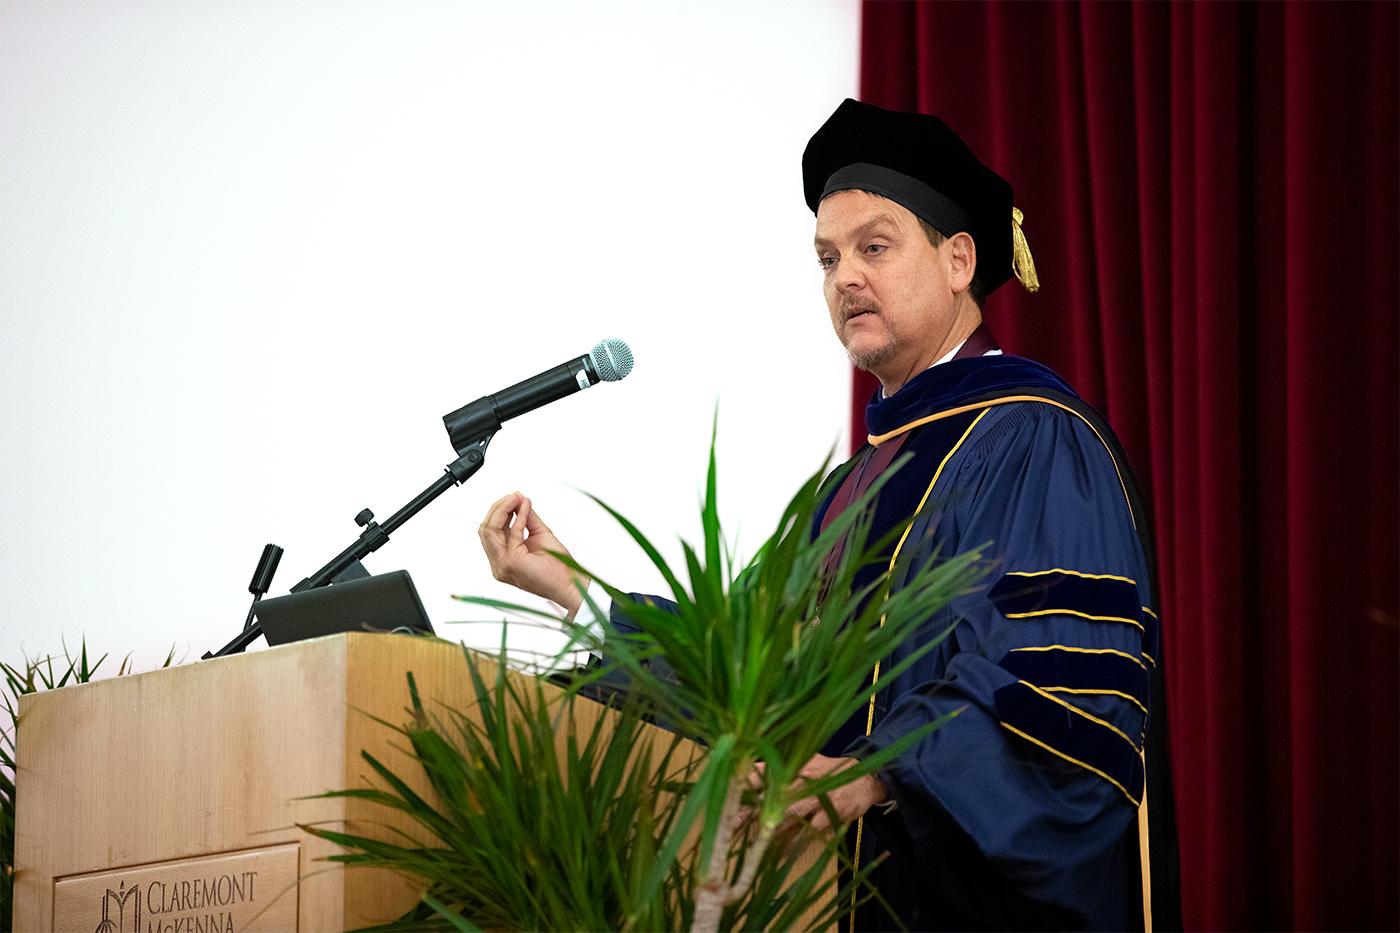 Prof. Gaston Espinosa